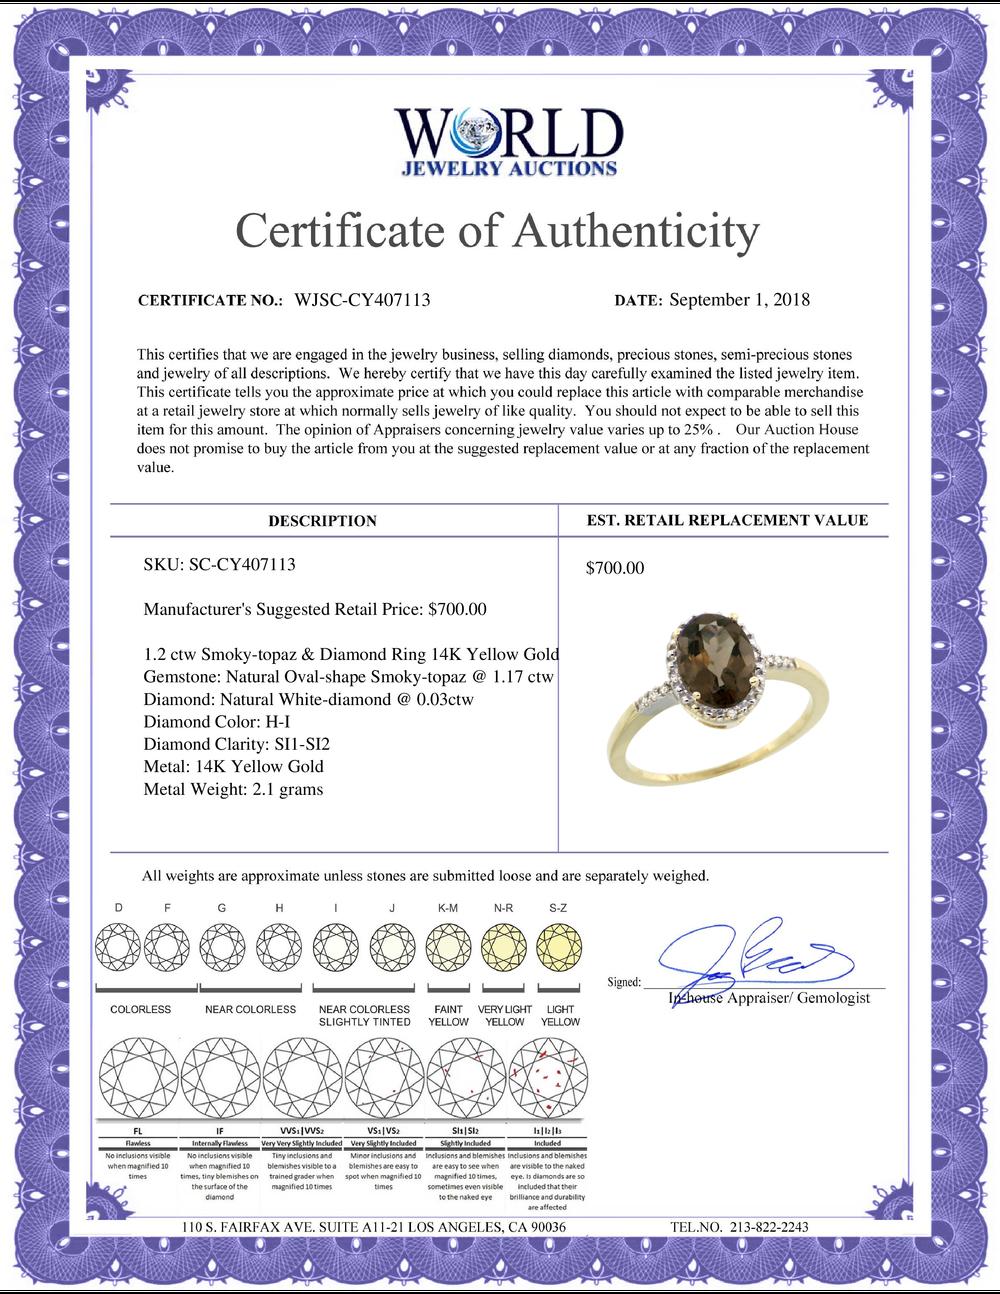 Lot 4051: Natural 1.2 ctw Smoky-topaz & Diamond Engagement Ring 14K Yellow Gold - REF-23F2N